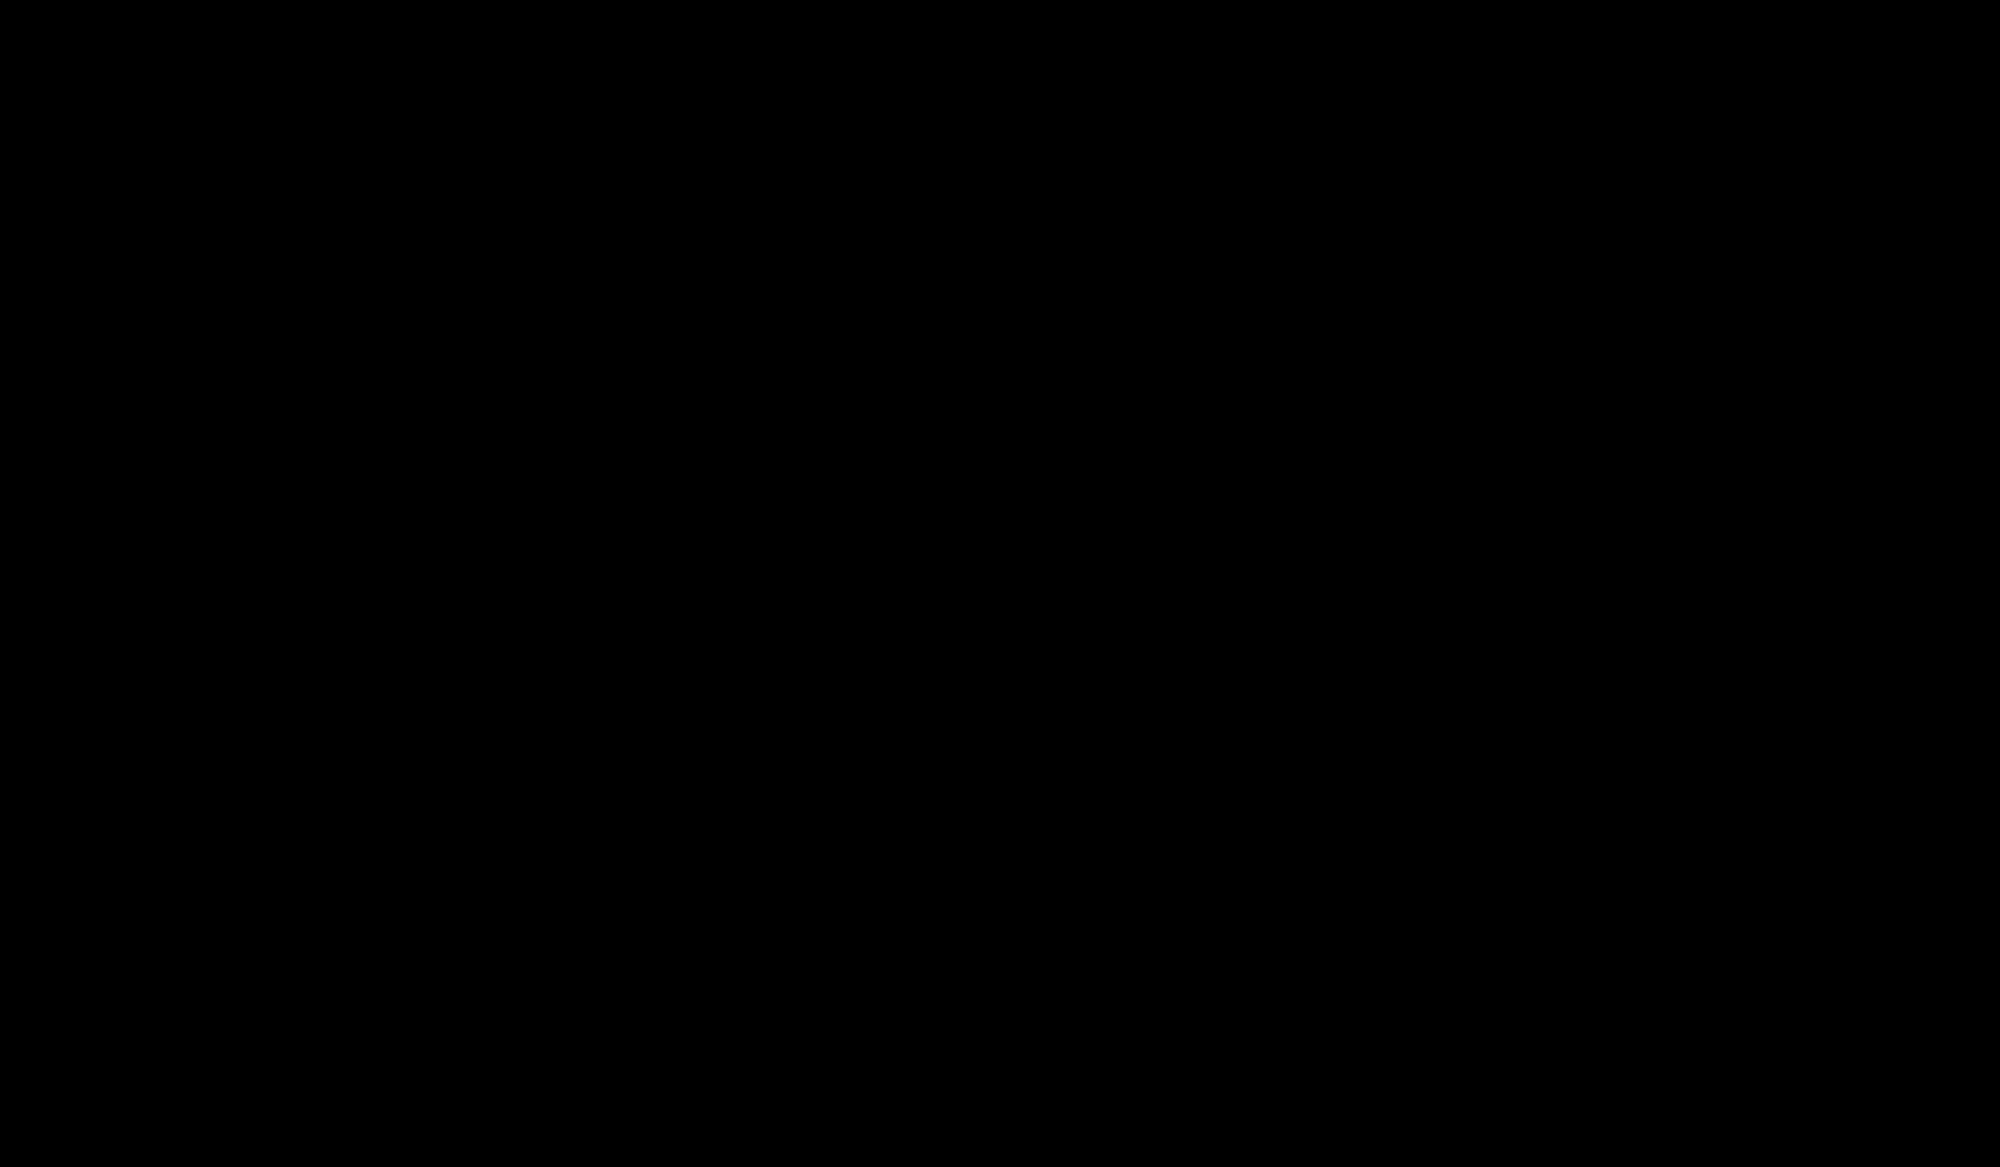 Clipart music whole note. File wholenote svg wikimedia